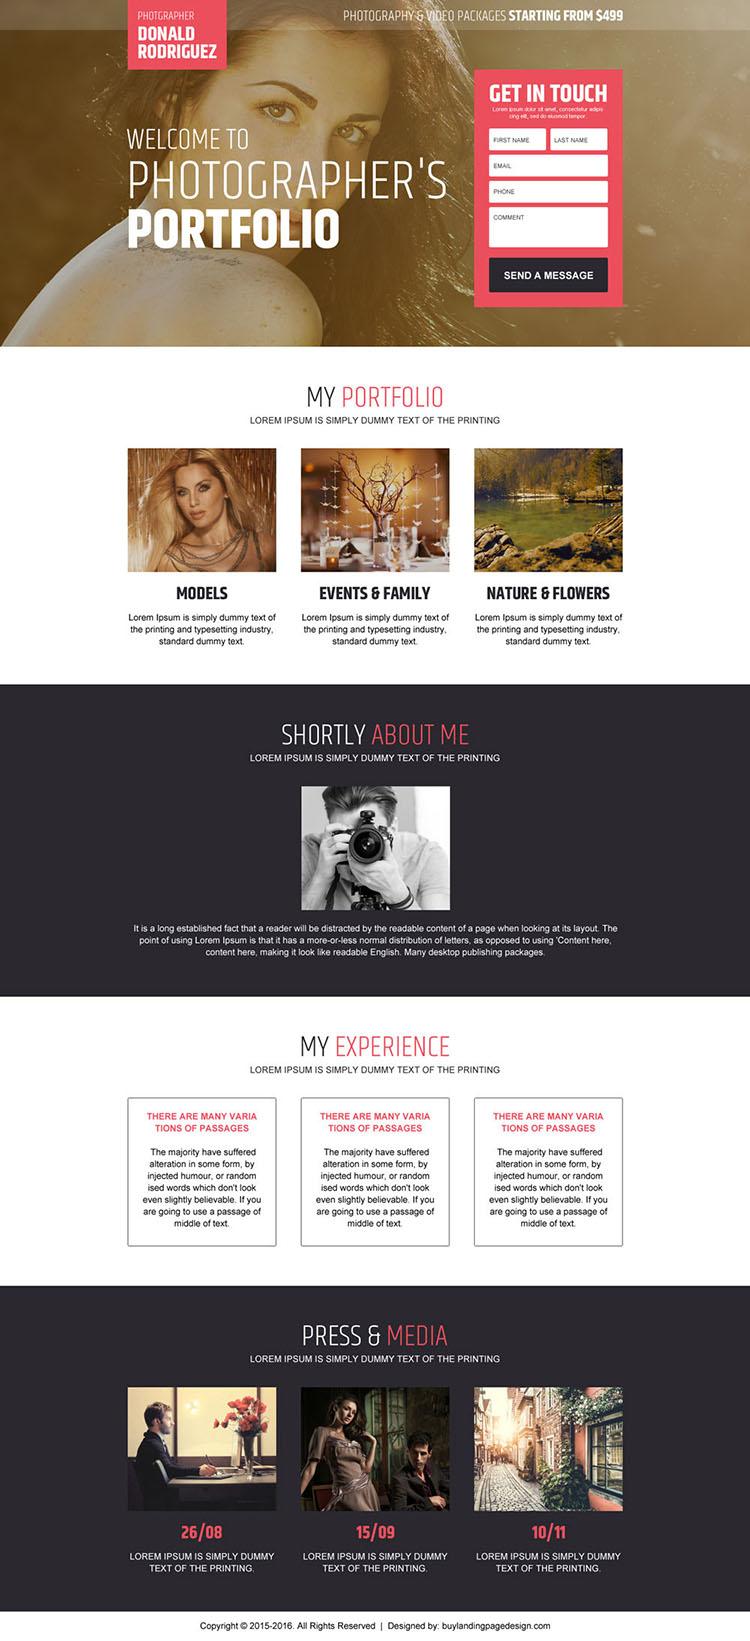 photographers portfolio converting landing page design